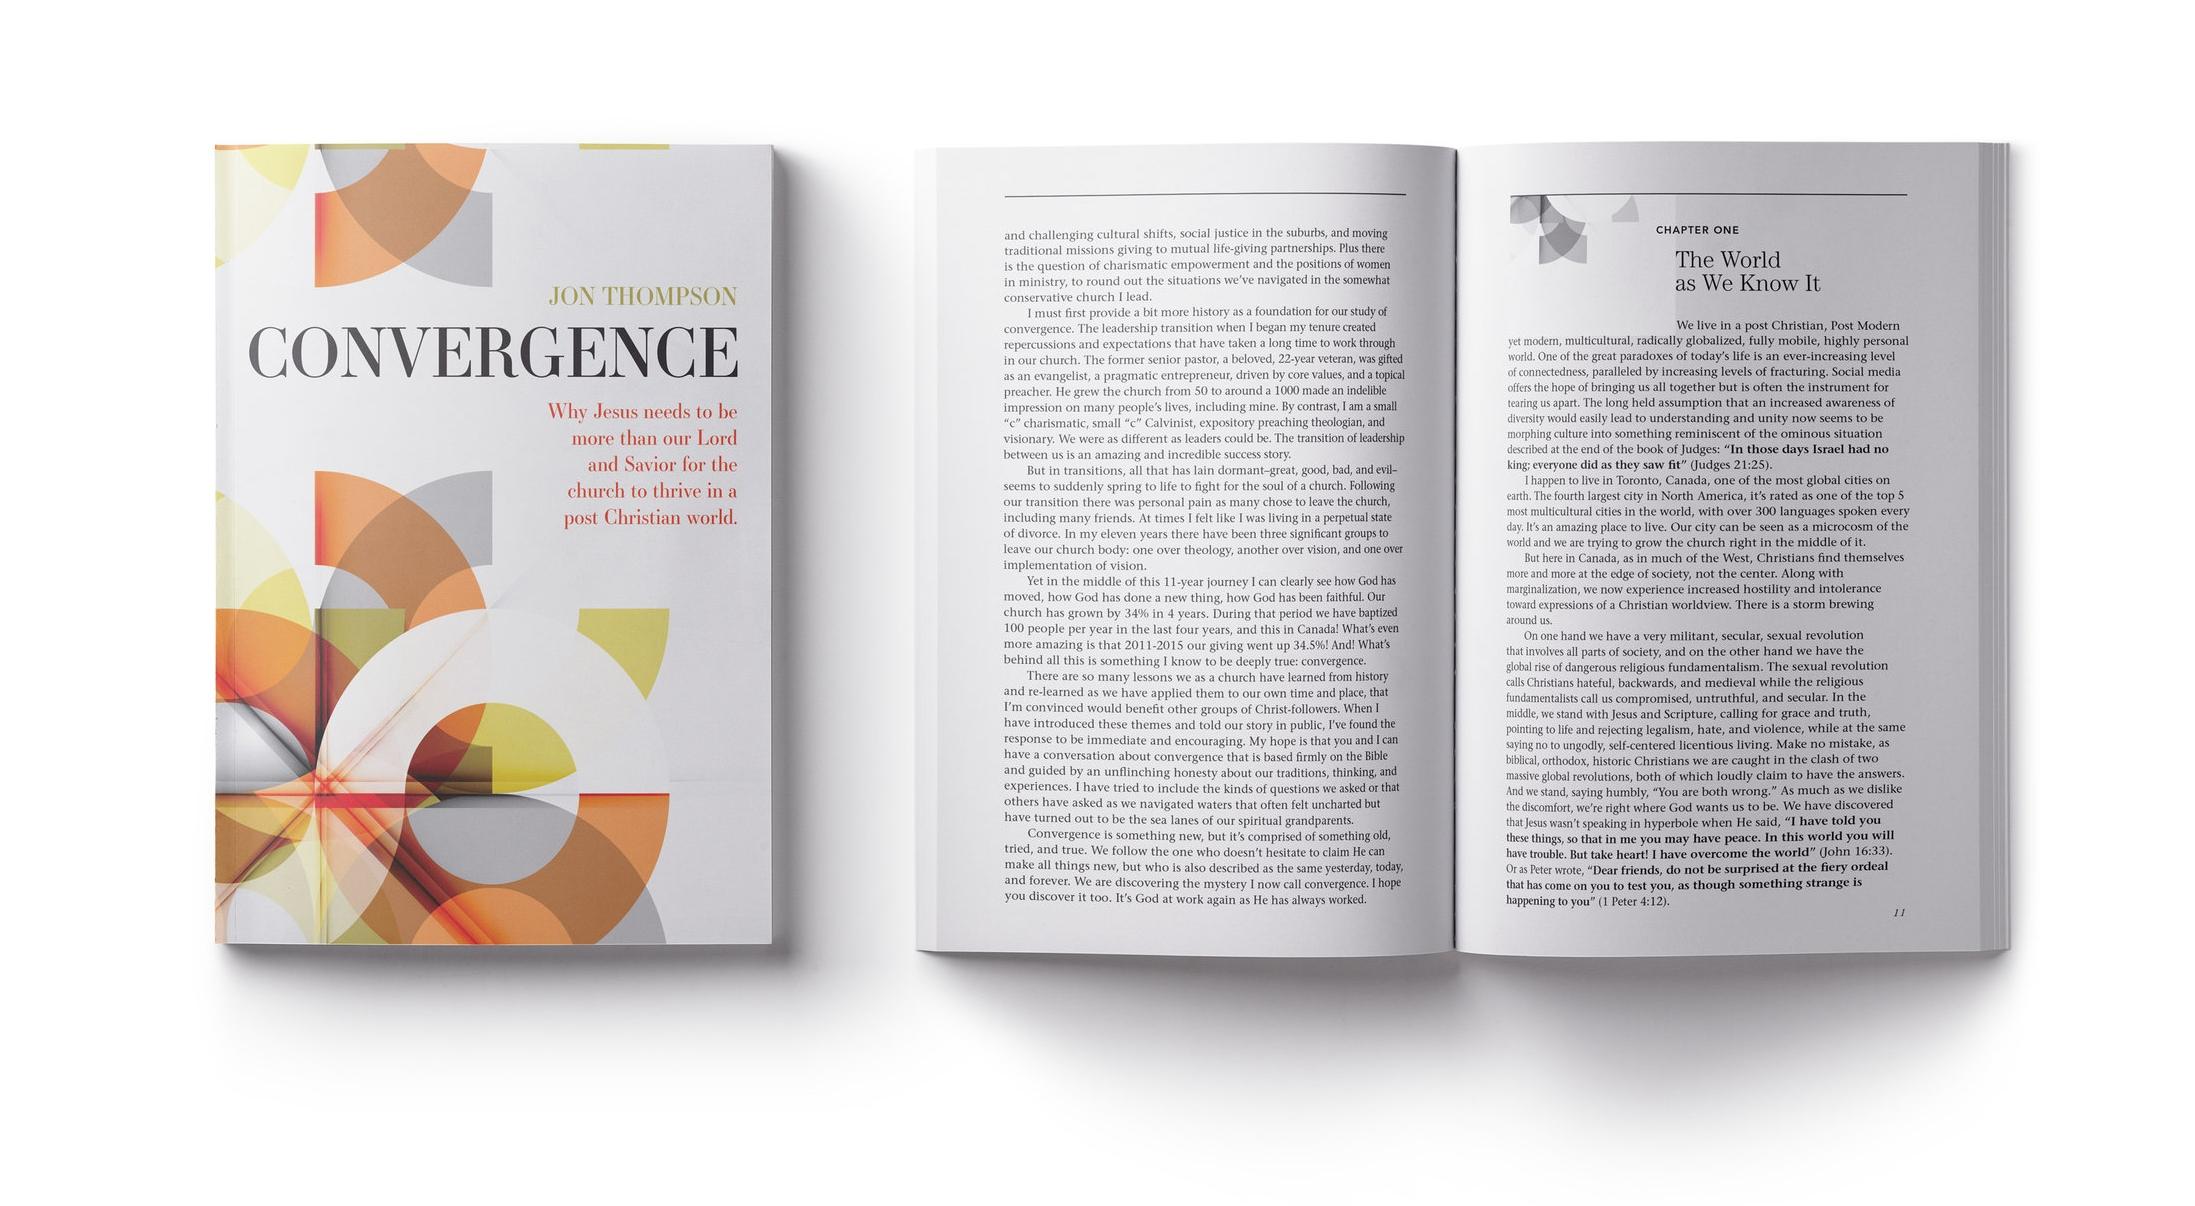 18-11-26-Convergence-Book-D-2.jpg